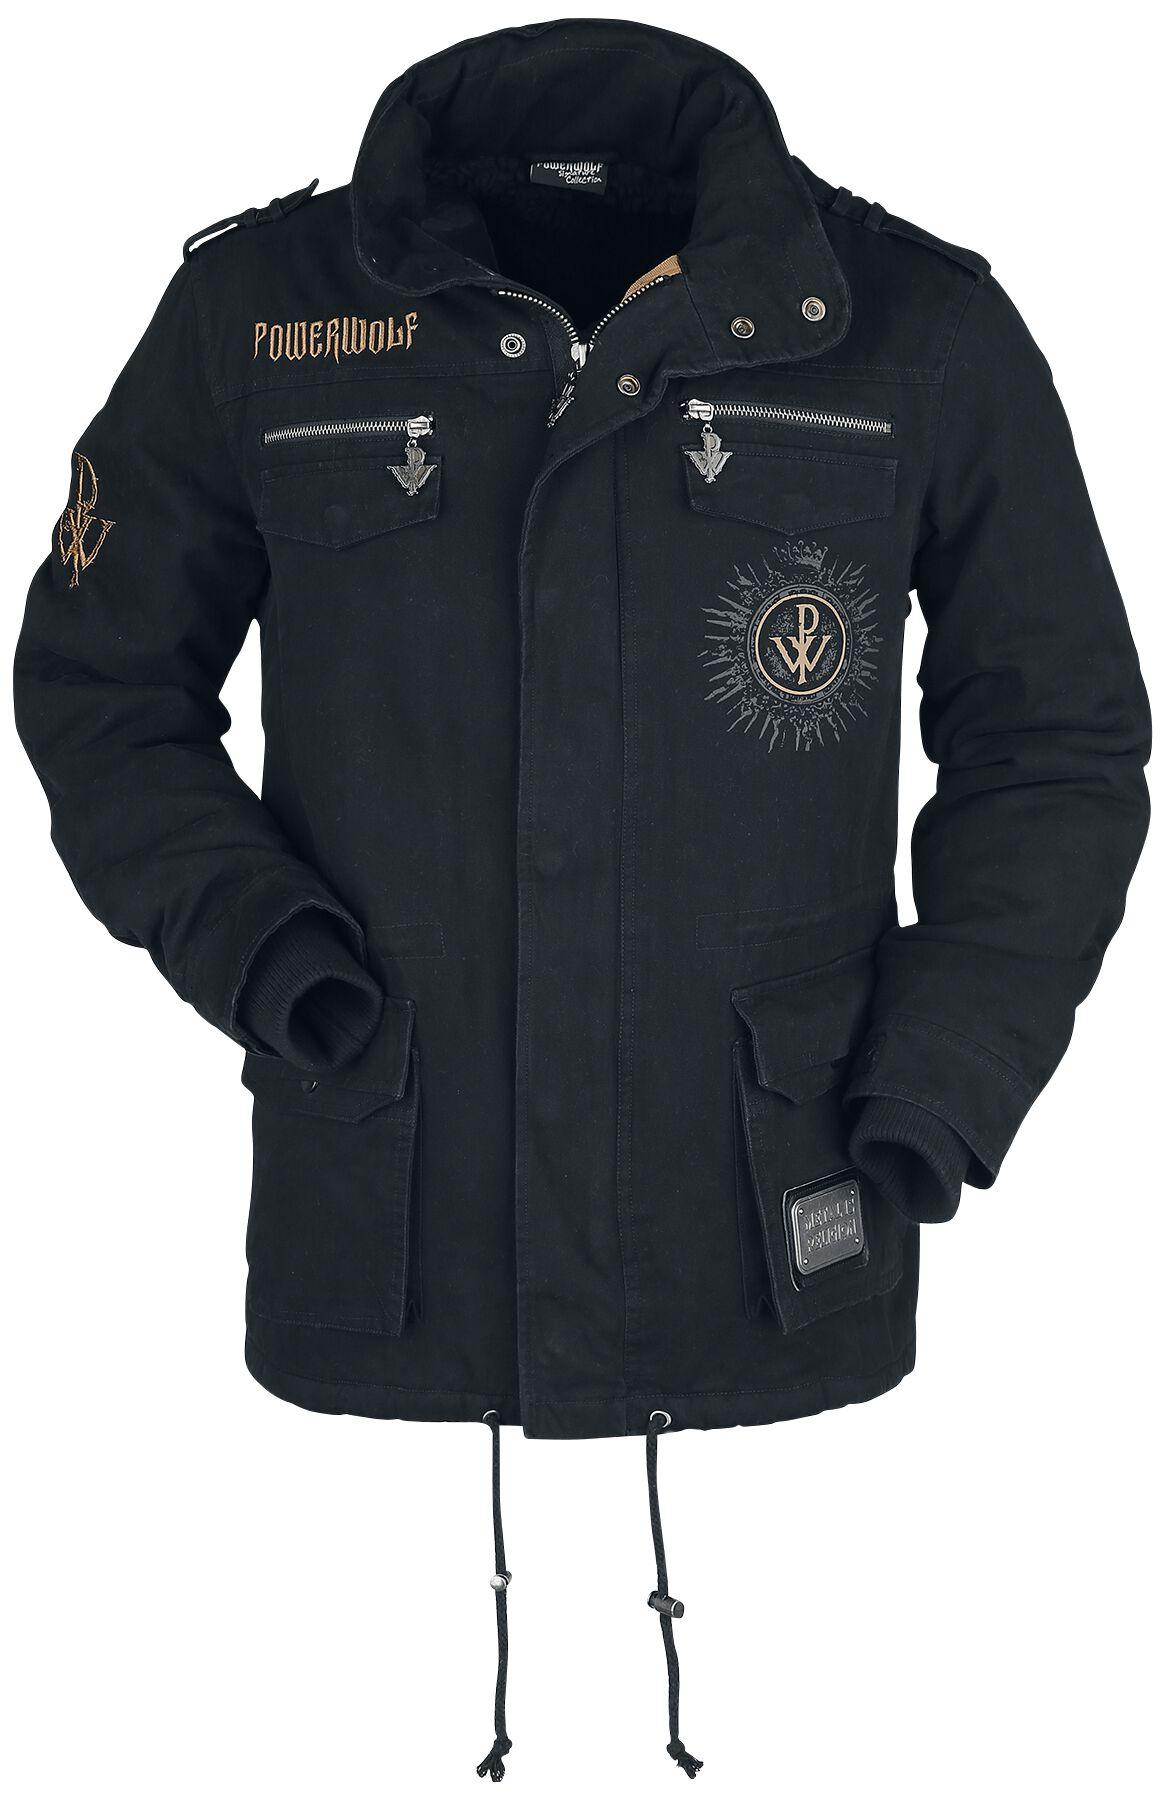 Powerwolf EMP Signature Collection Winter Jacket black